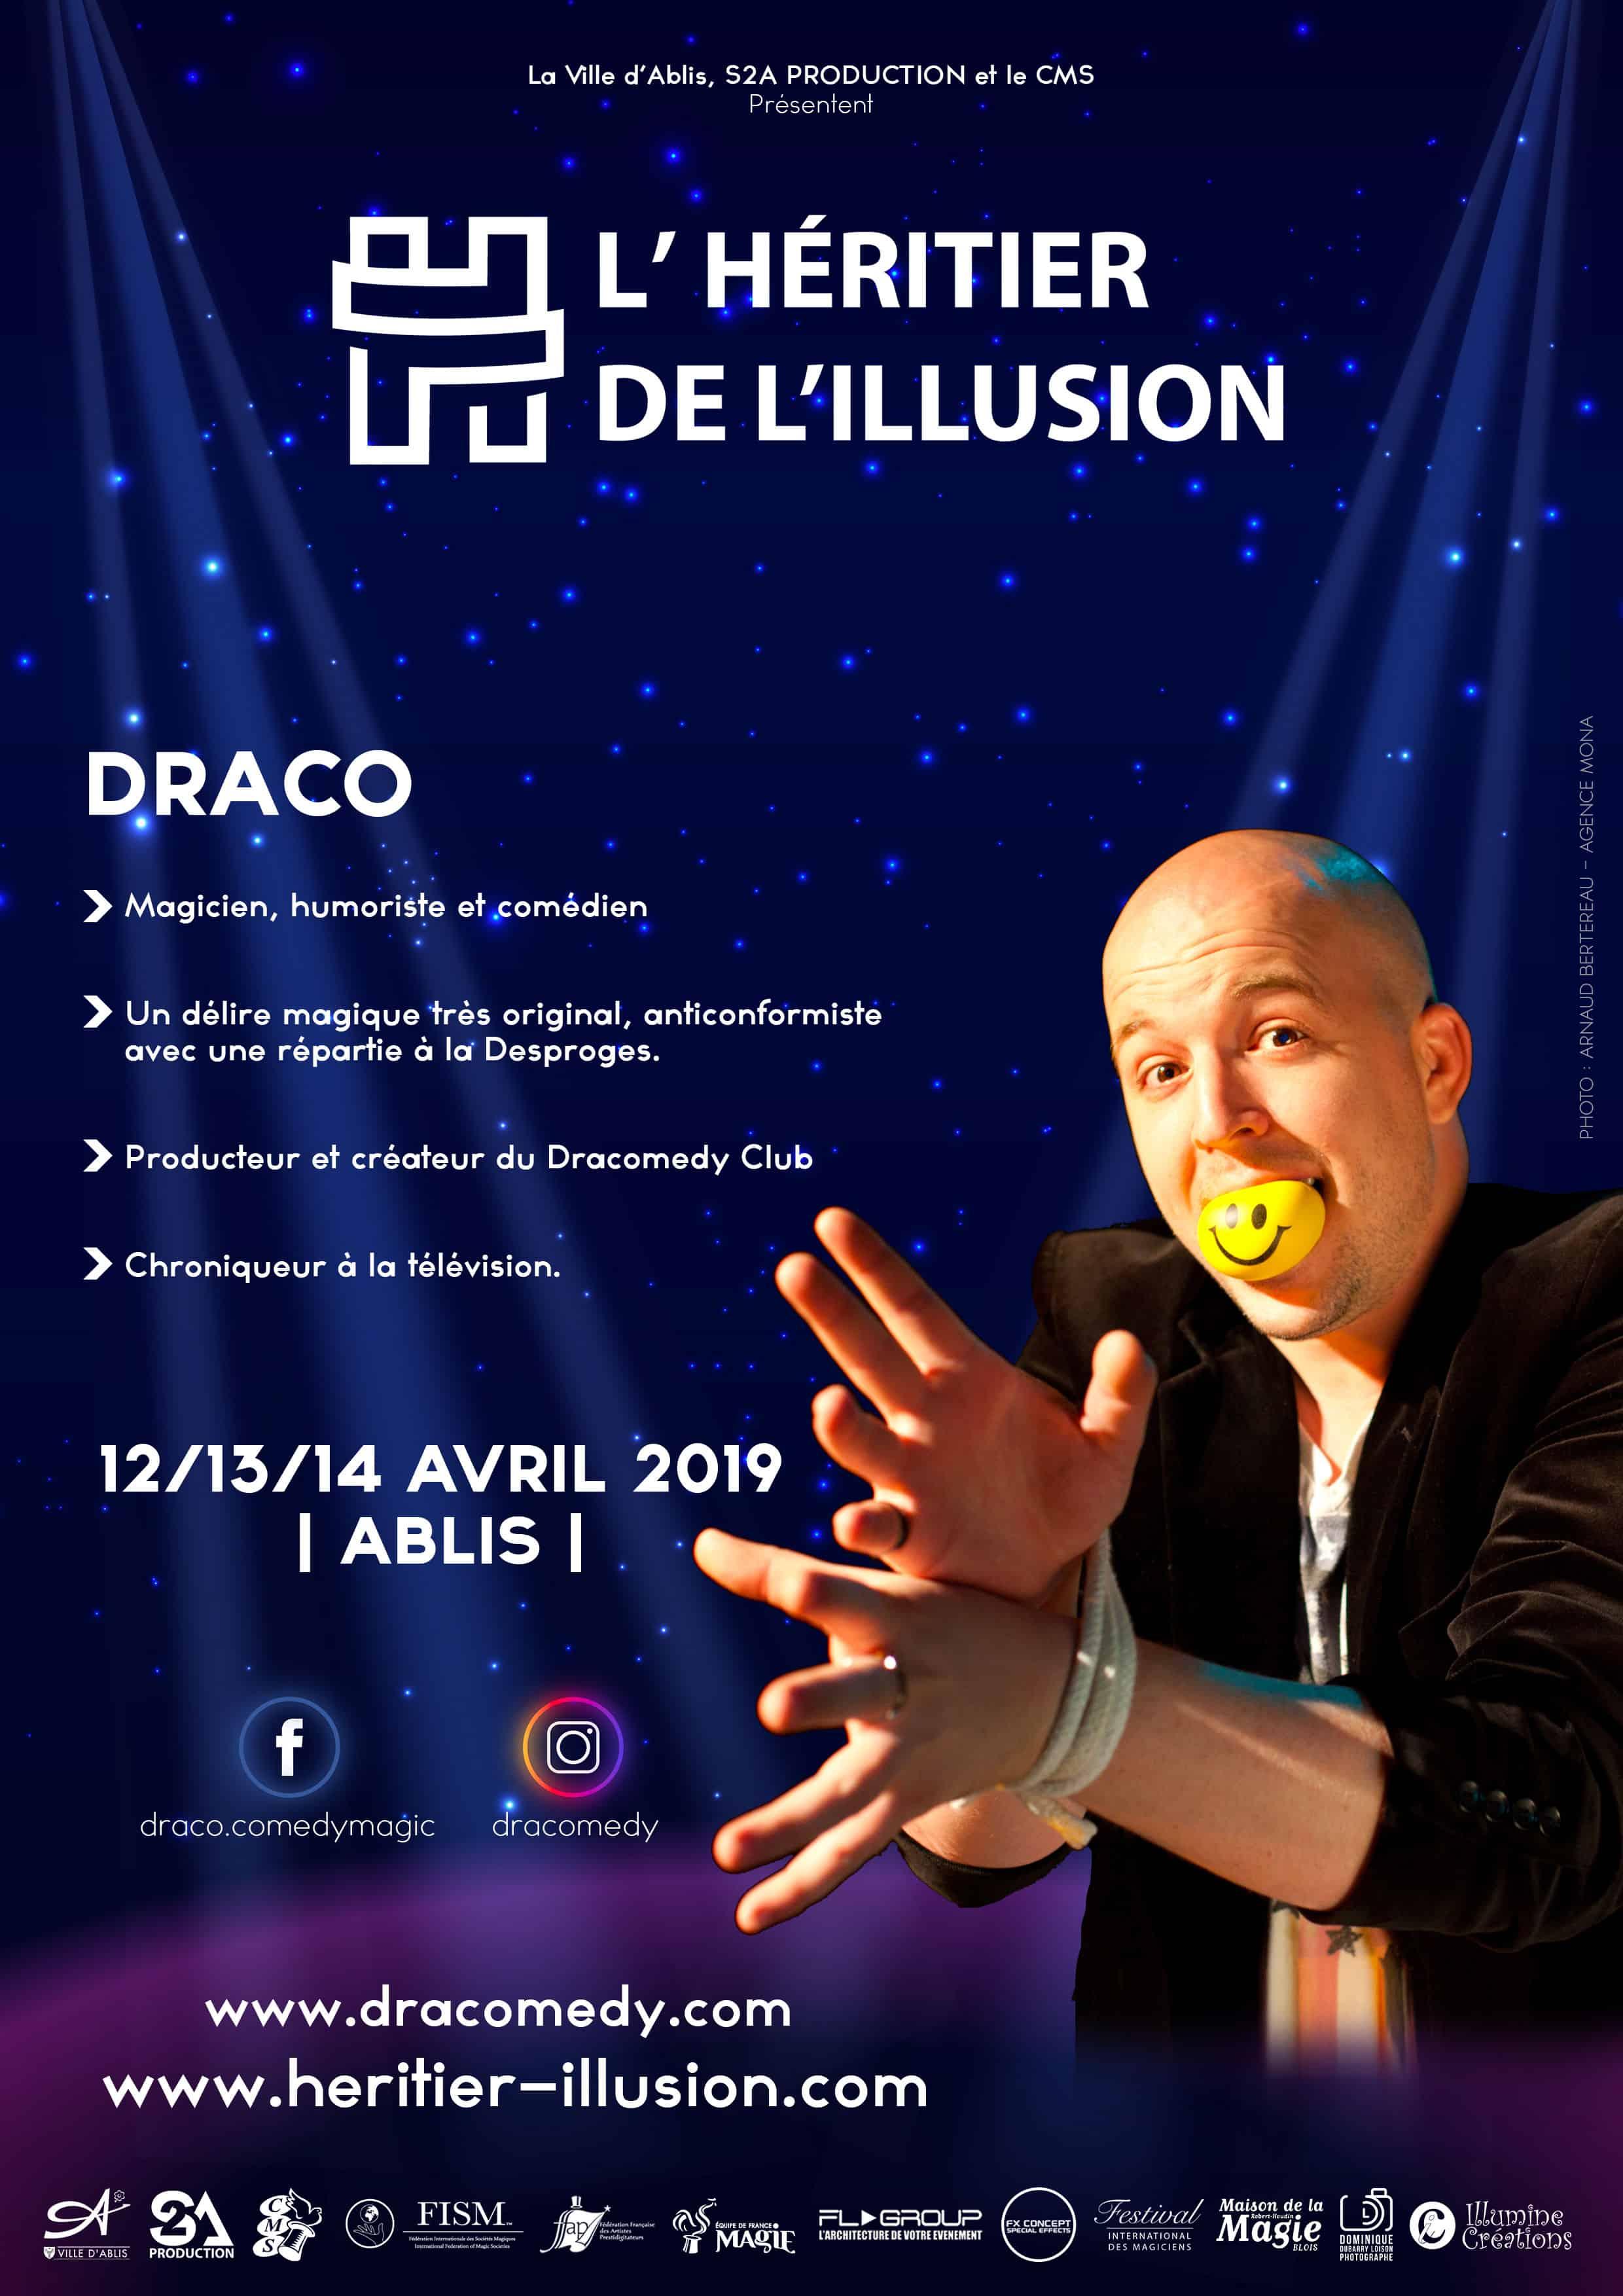 Draco Magicien humoriste à Rouen - PHOTO : ARNAUD BERTEREAU - AGENCE MONA